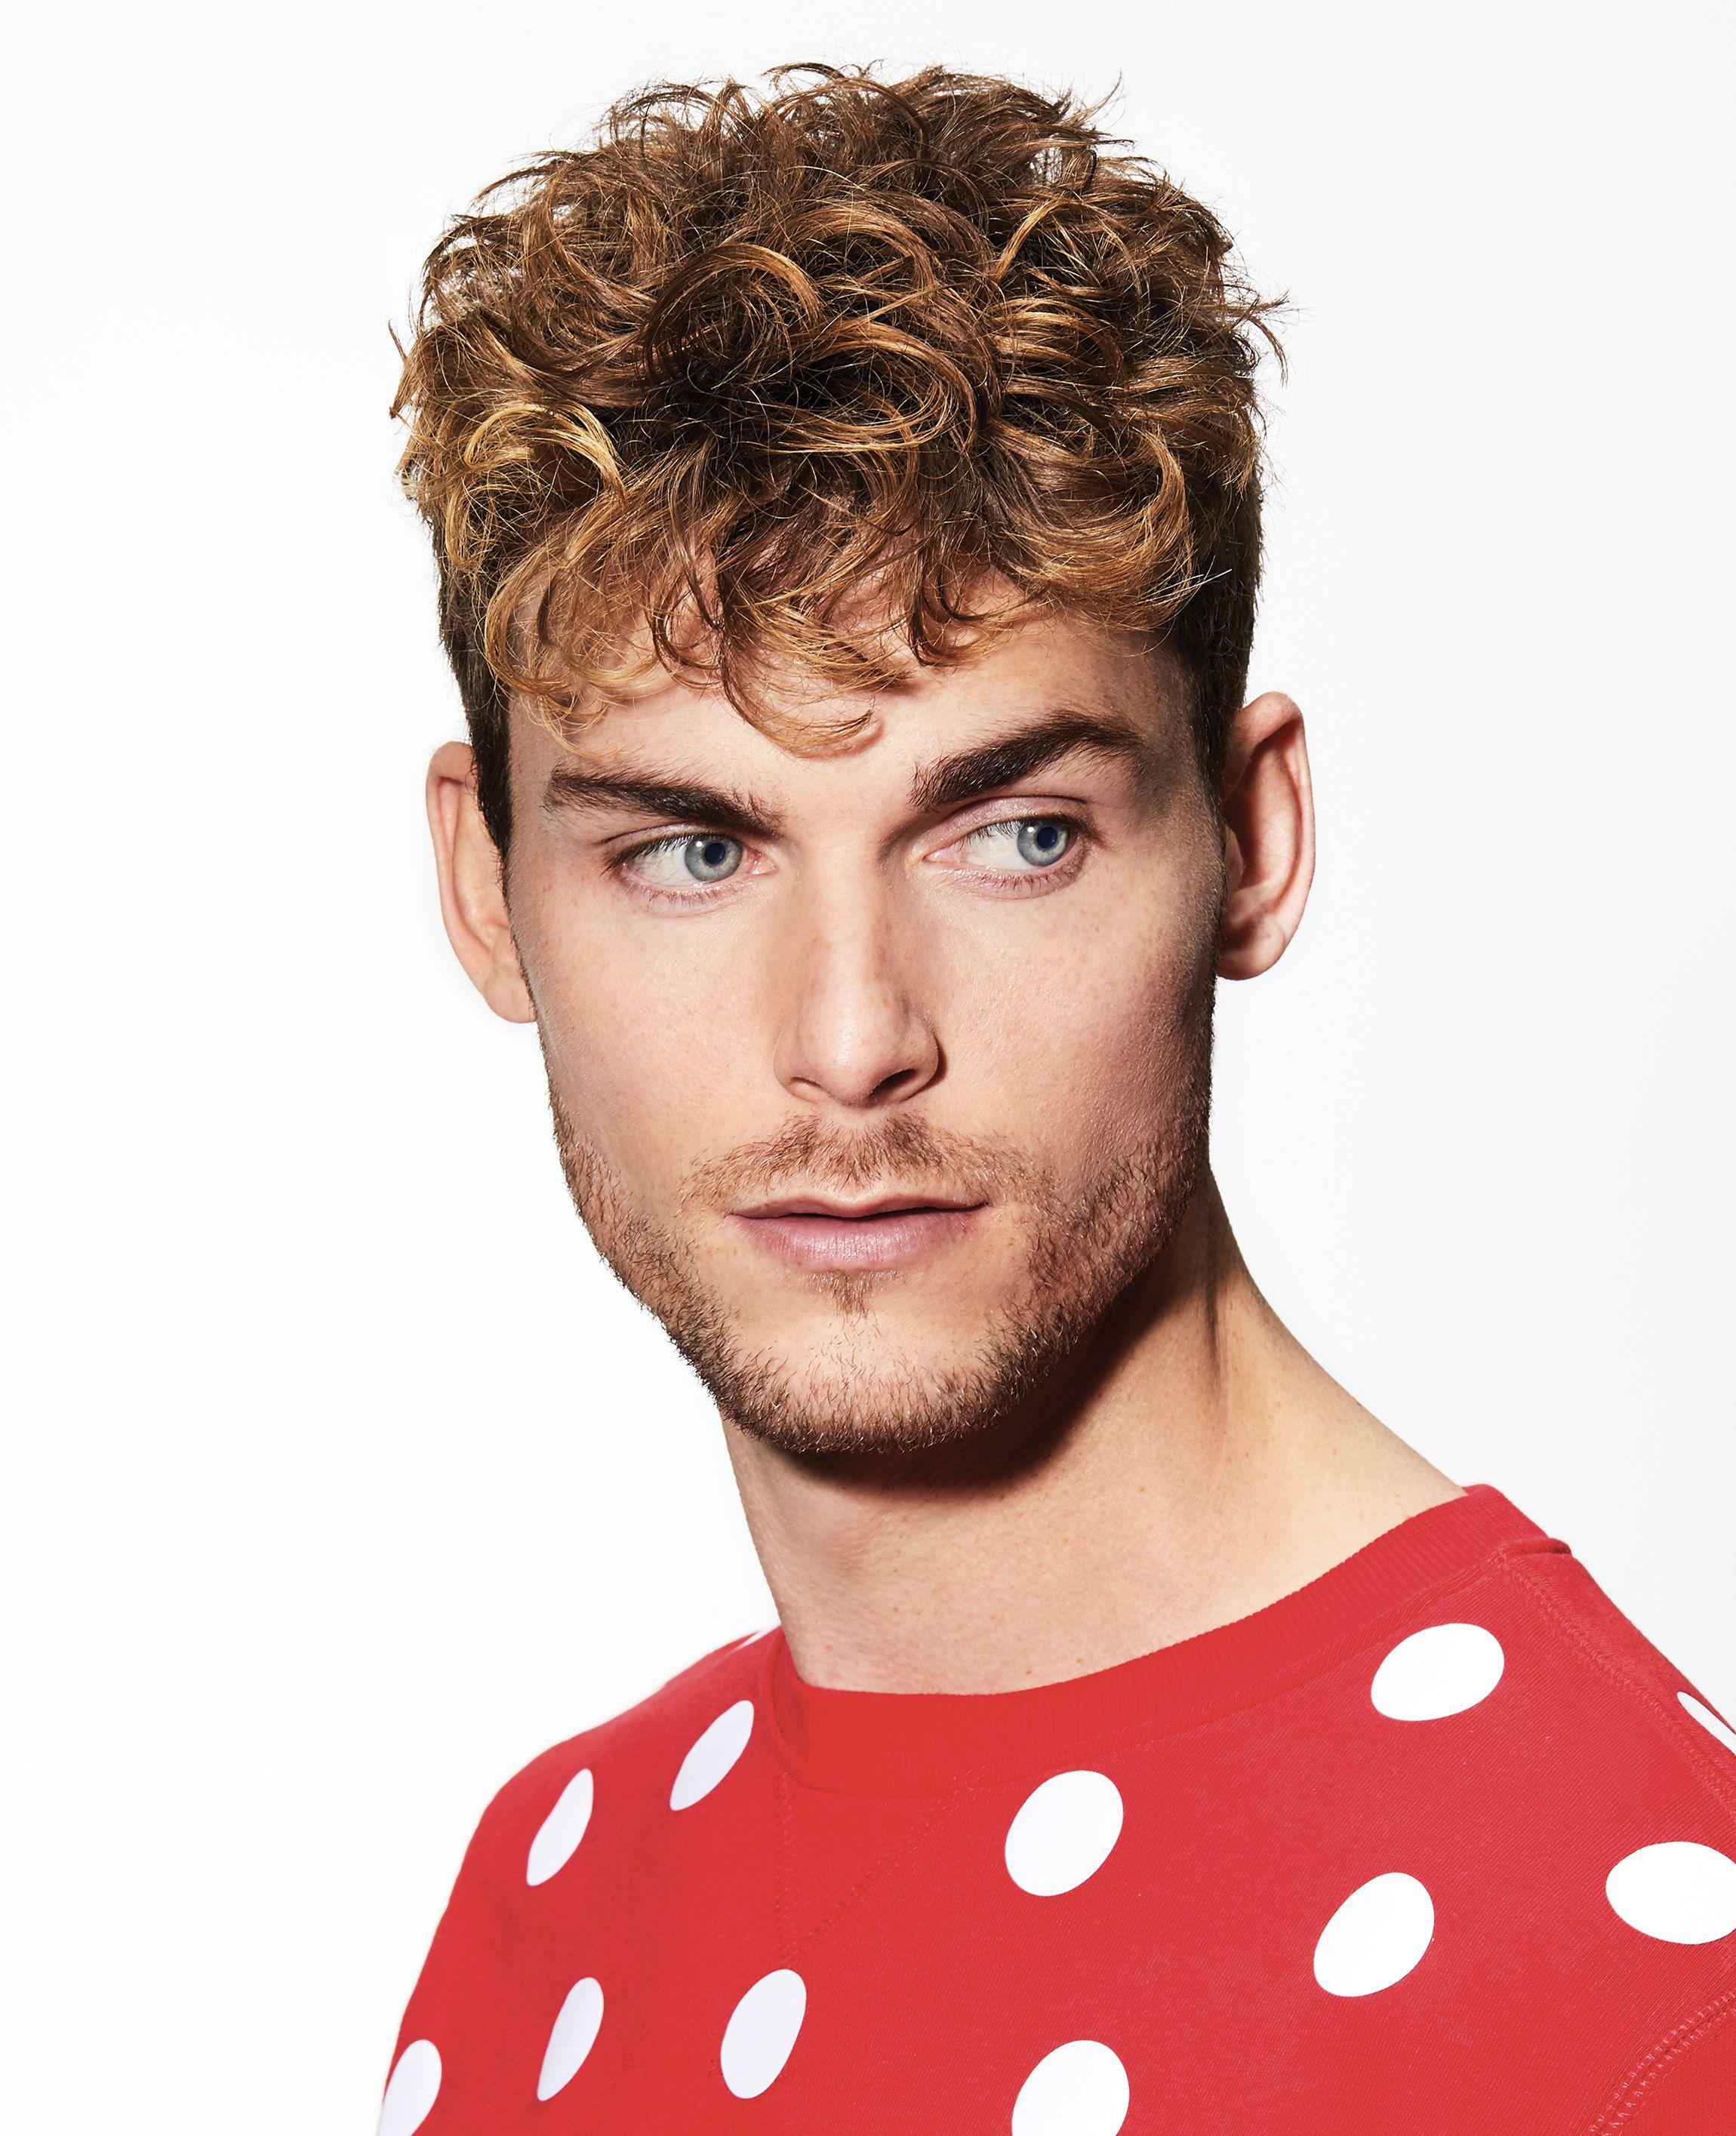 Enzo Coupe Homme Cheveux Boucles Coiffure Coupe Homme Cheveux Homme